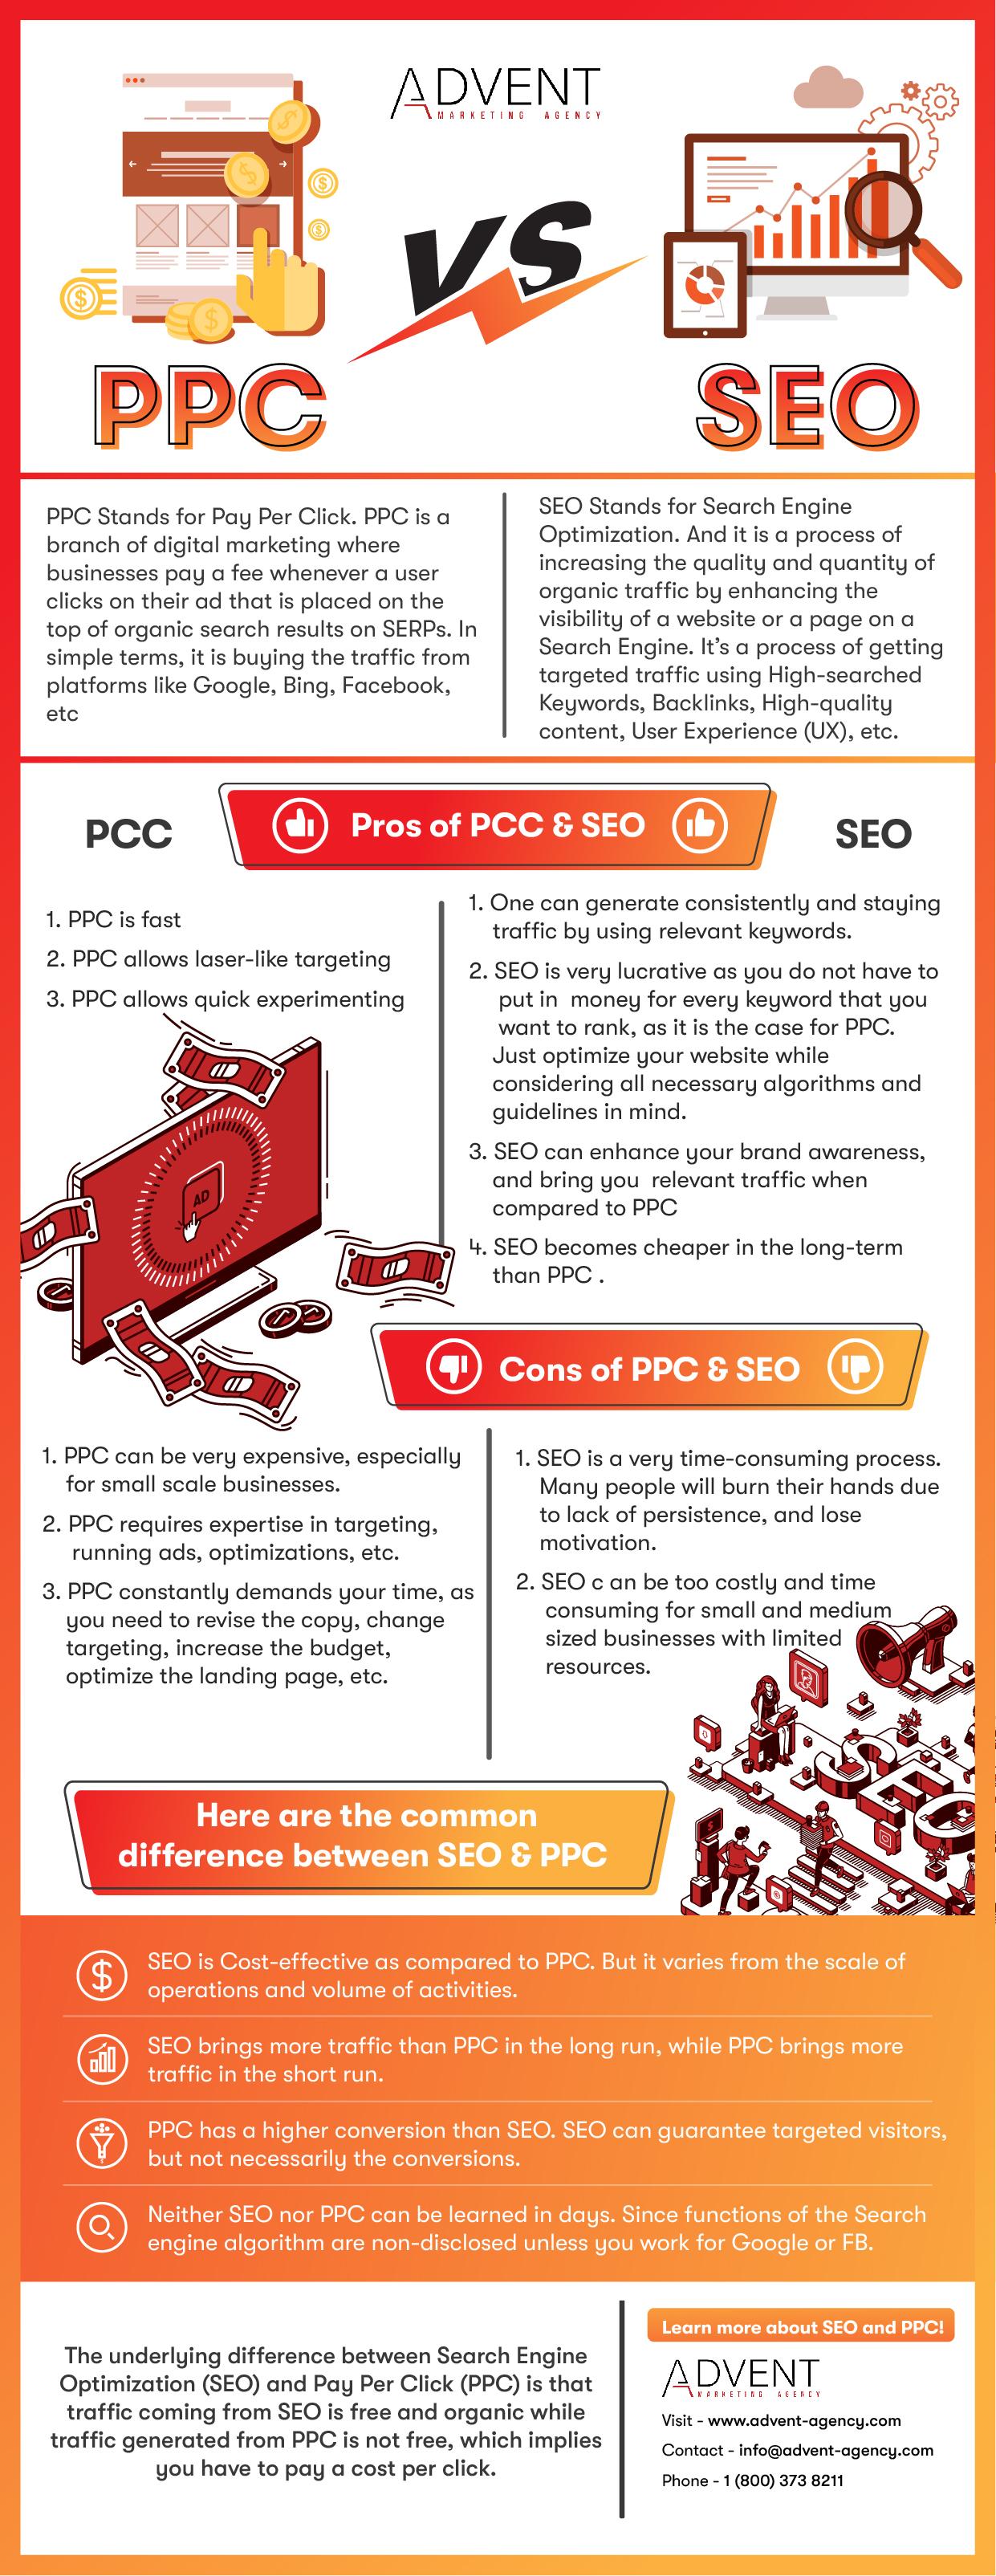 PPC vs. SEO